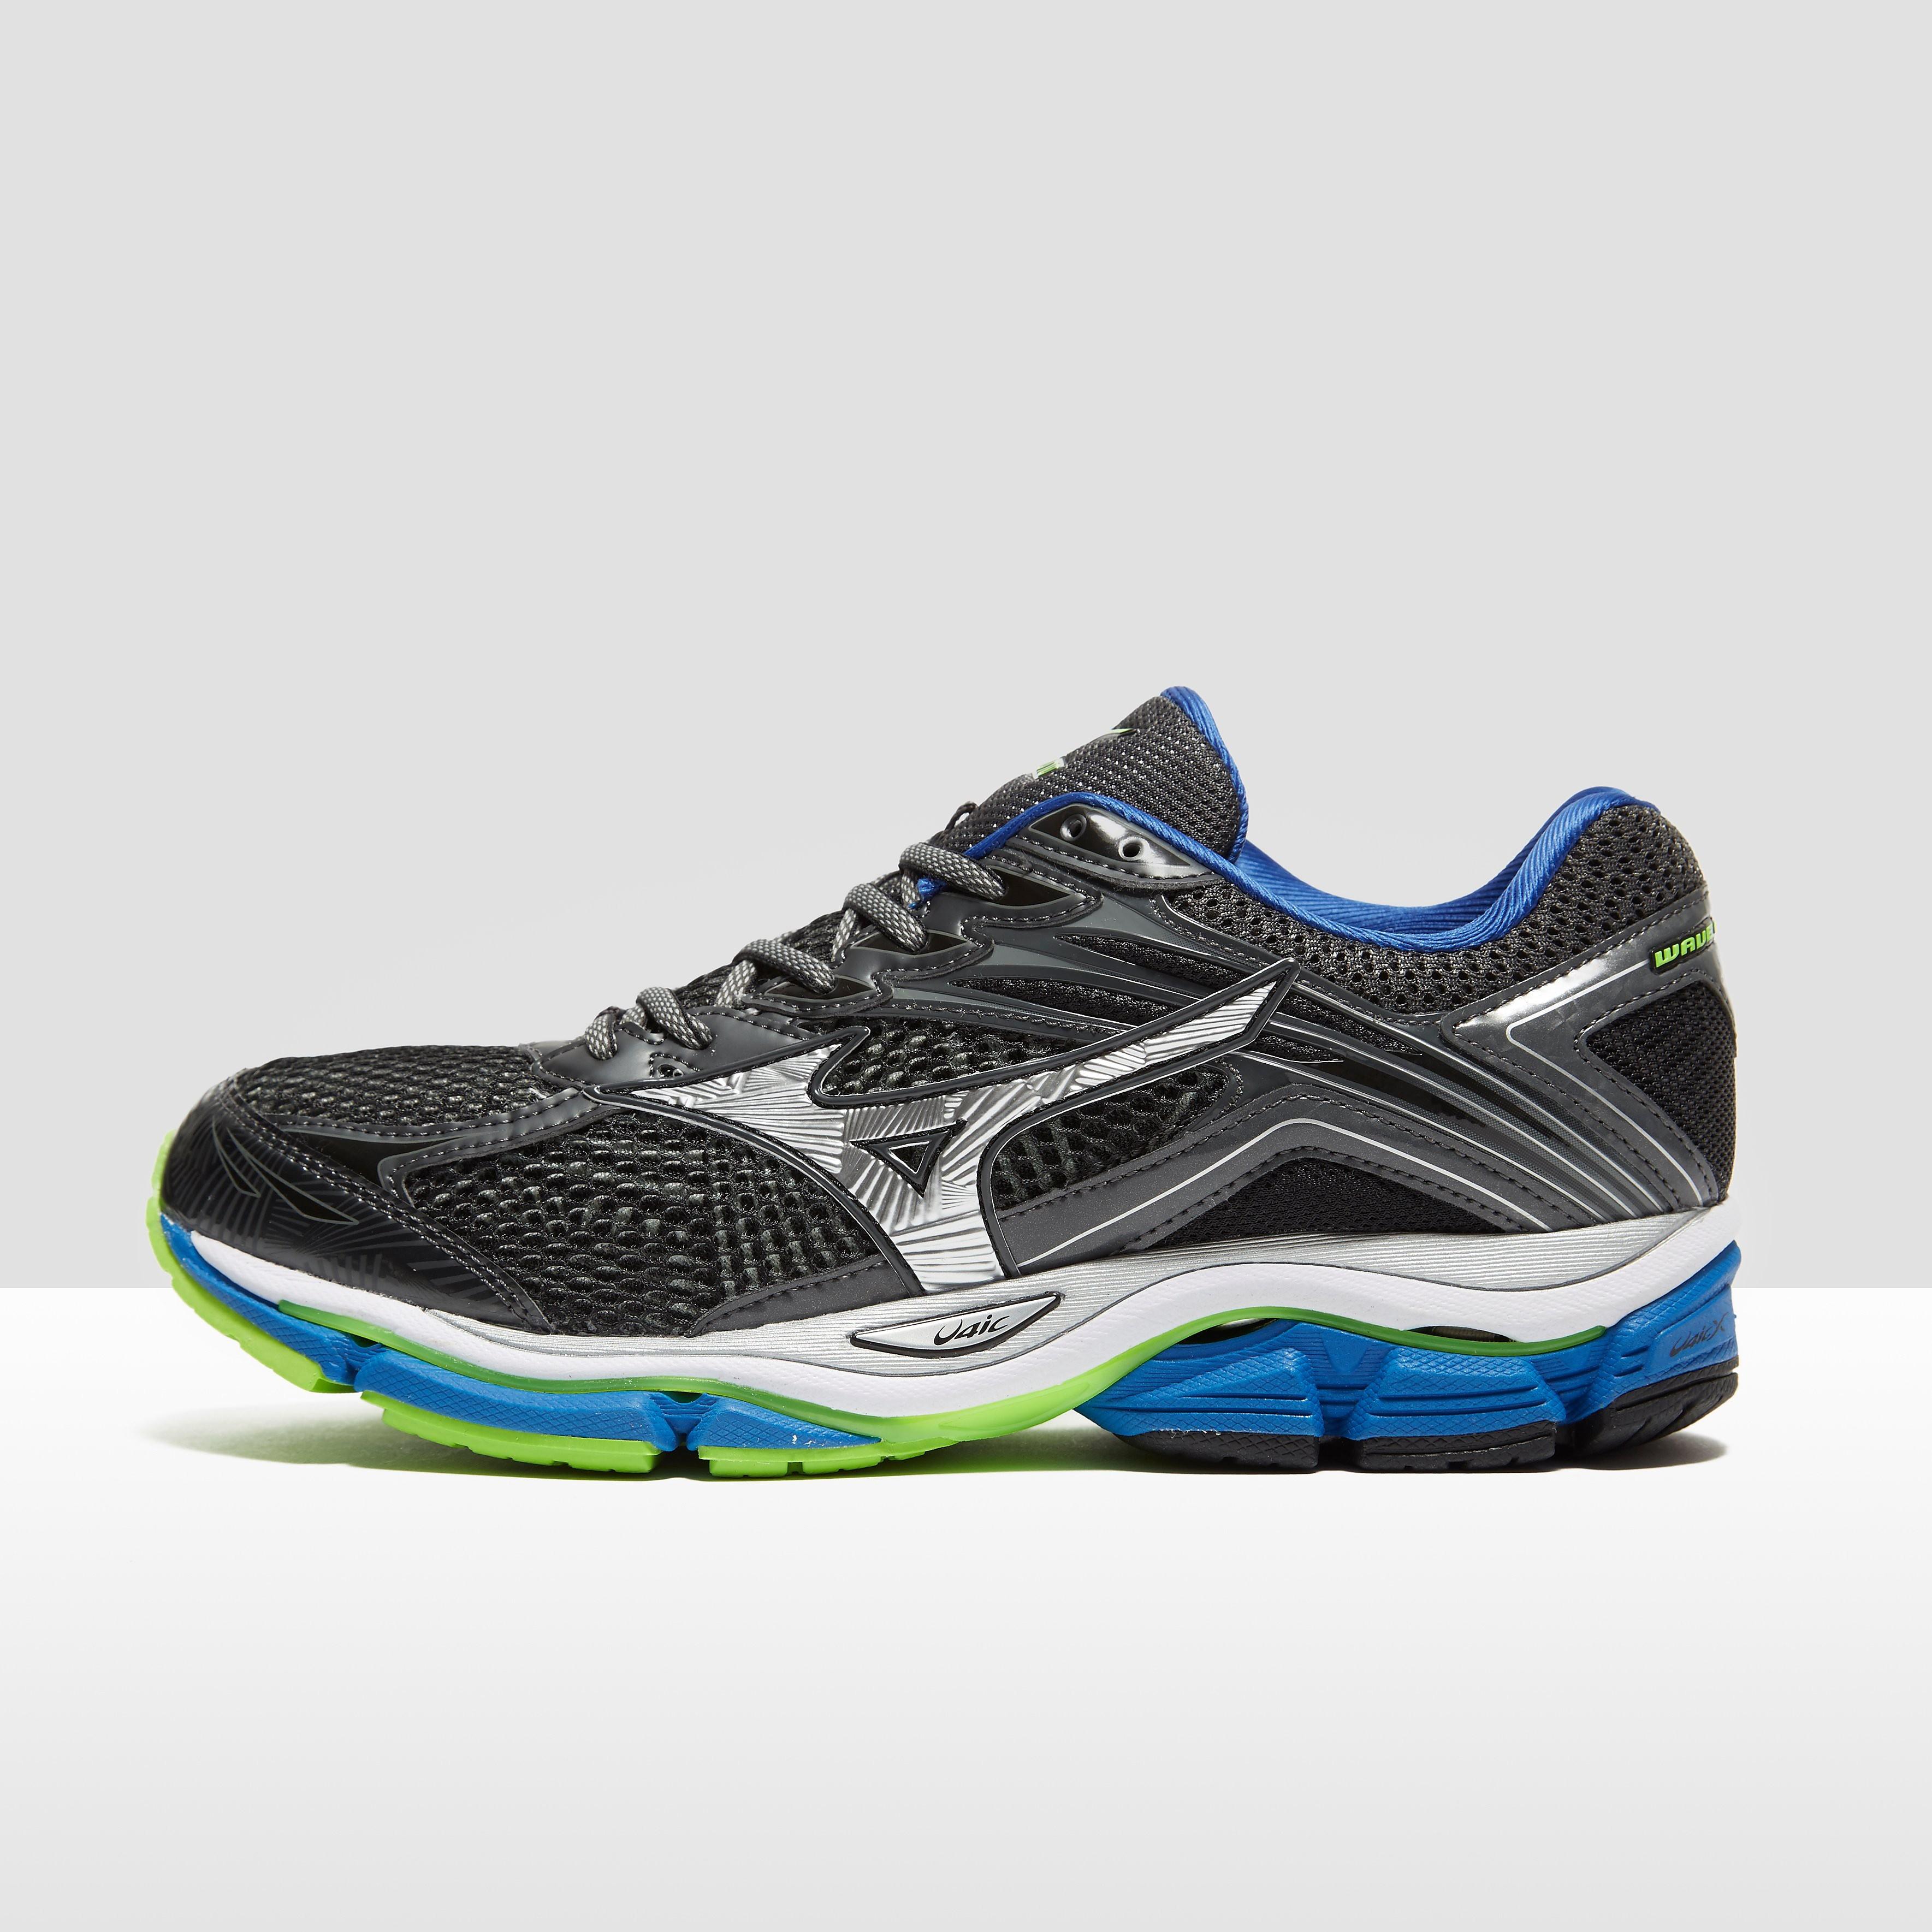 Mizuno Wave Enigma 6 Men's Running Shoes